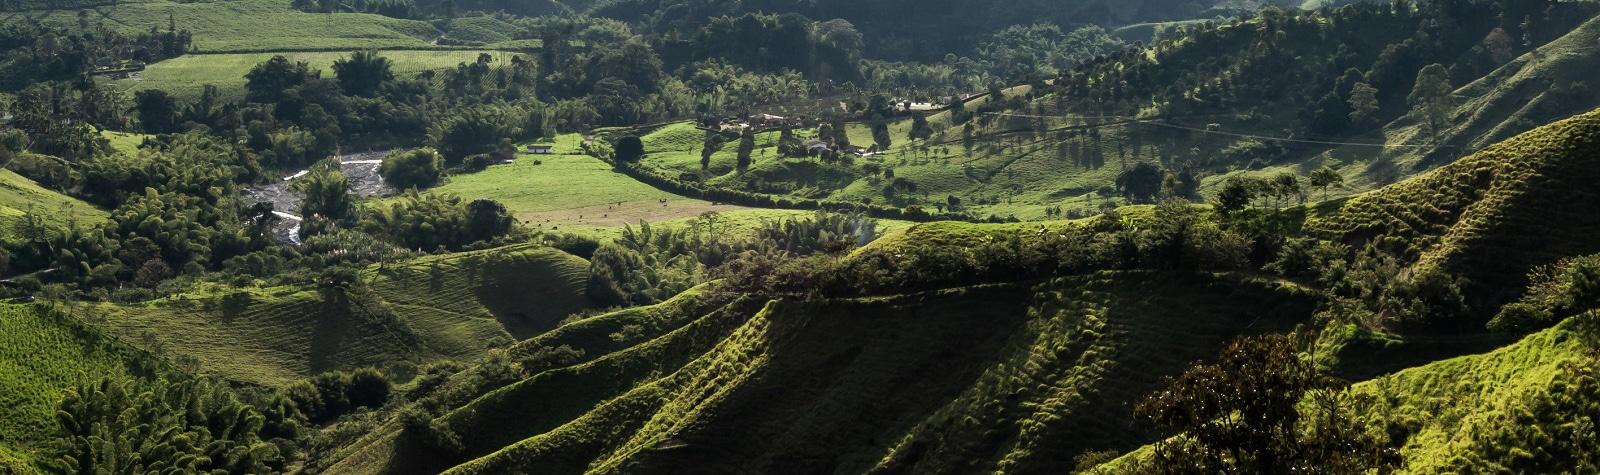 forest coffe farm colombia manizales green